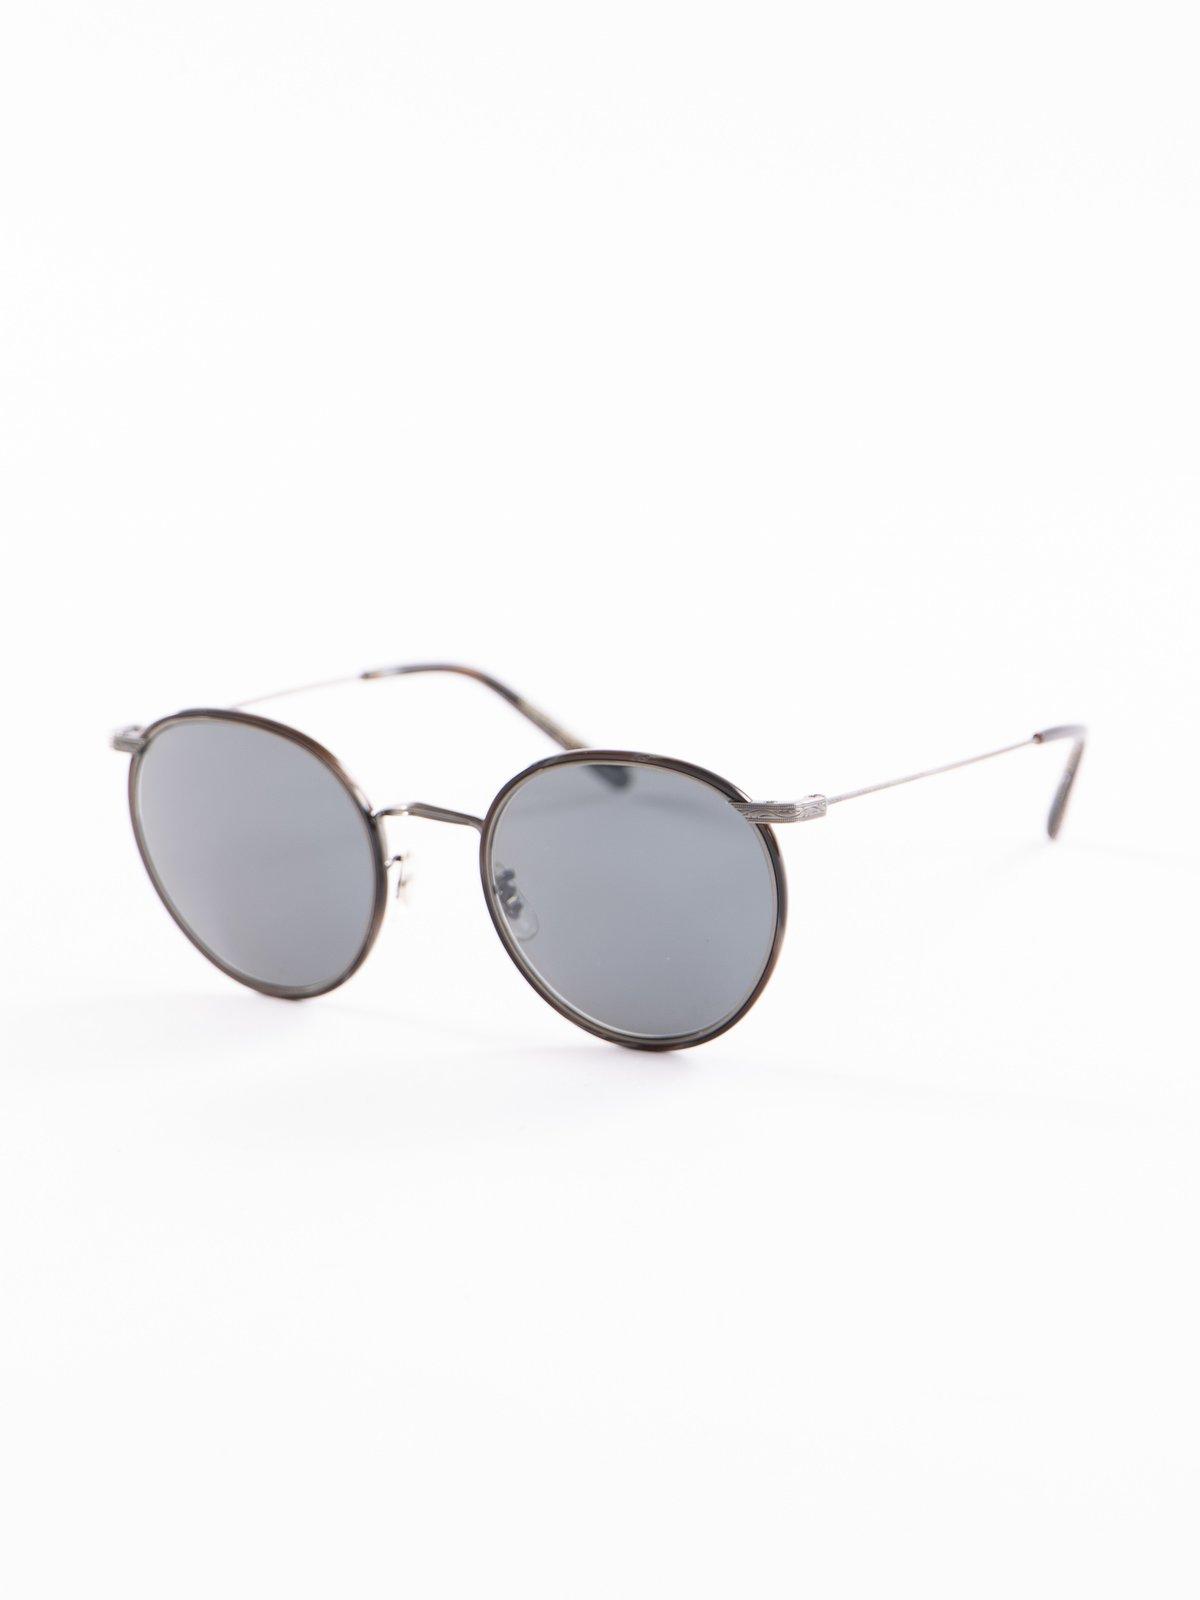 Pewter–Black Horn/Carbon Grey Casson Sunglasses - Image 2